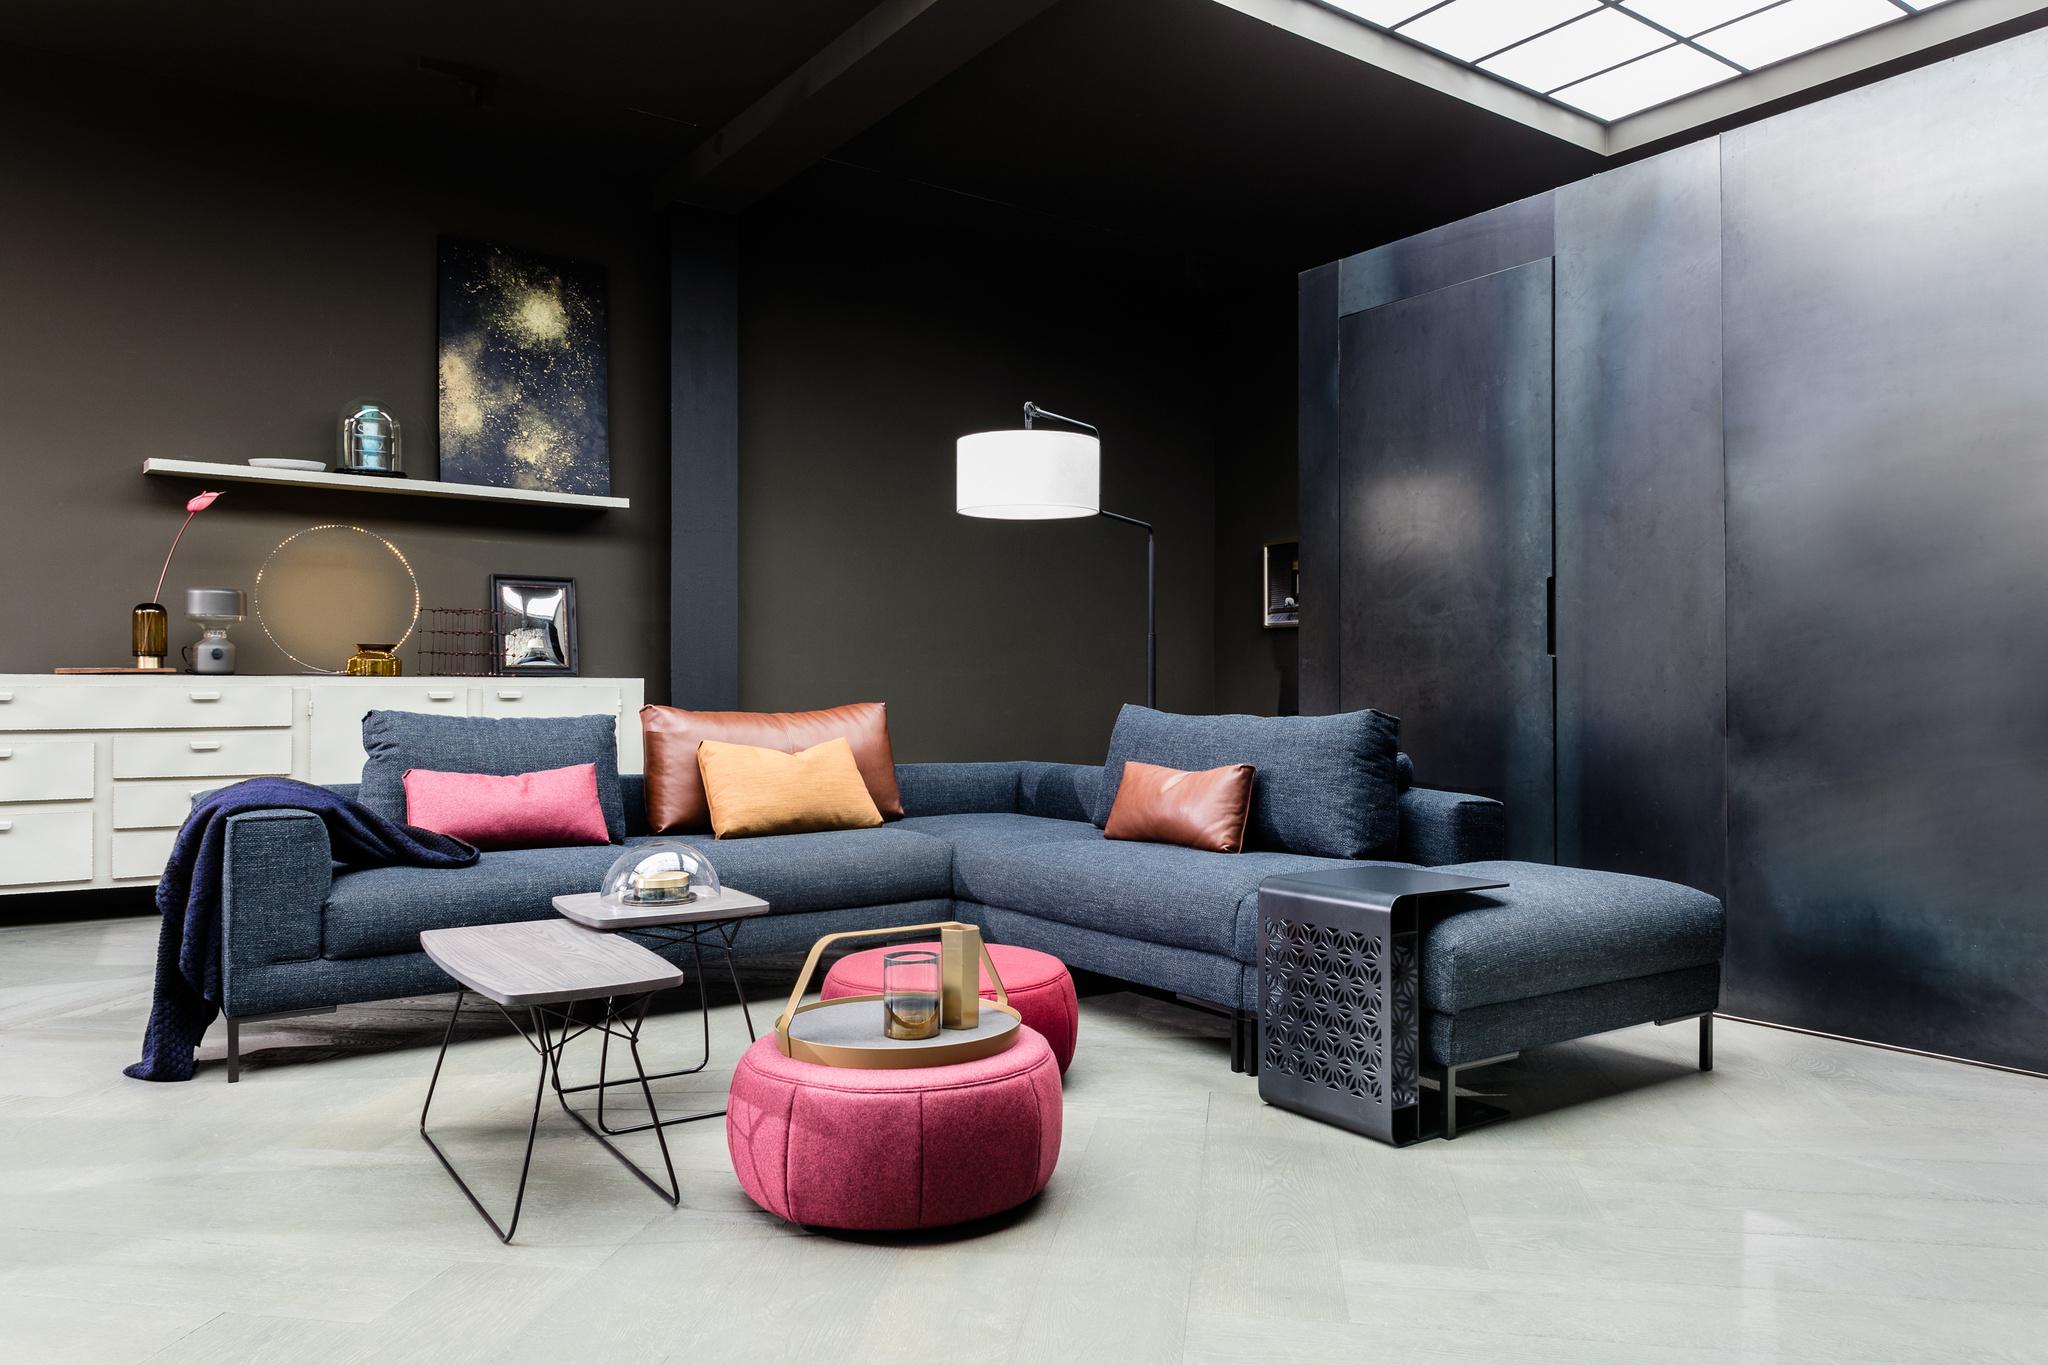 Design On Stock Aikon.Dutch Modern Lounge Sofa Aikon Lounge Design Your Own Sofa